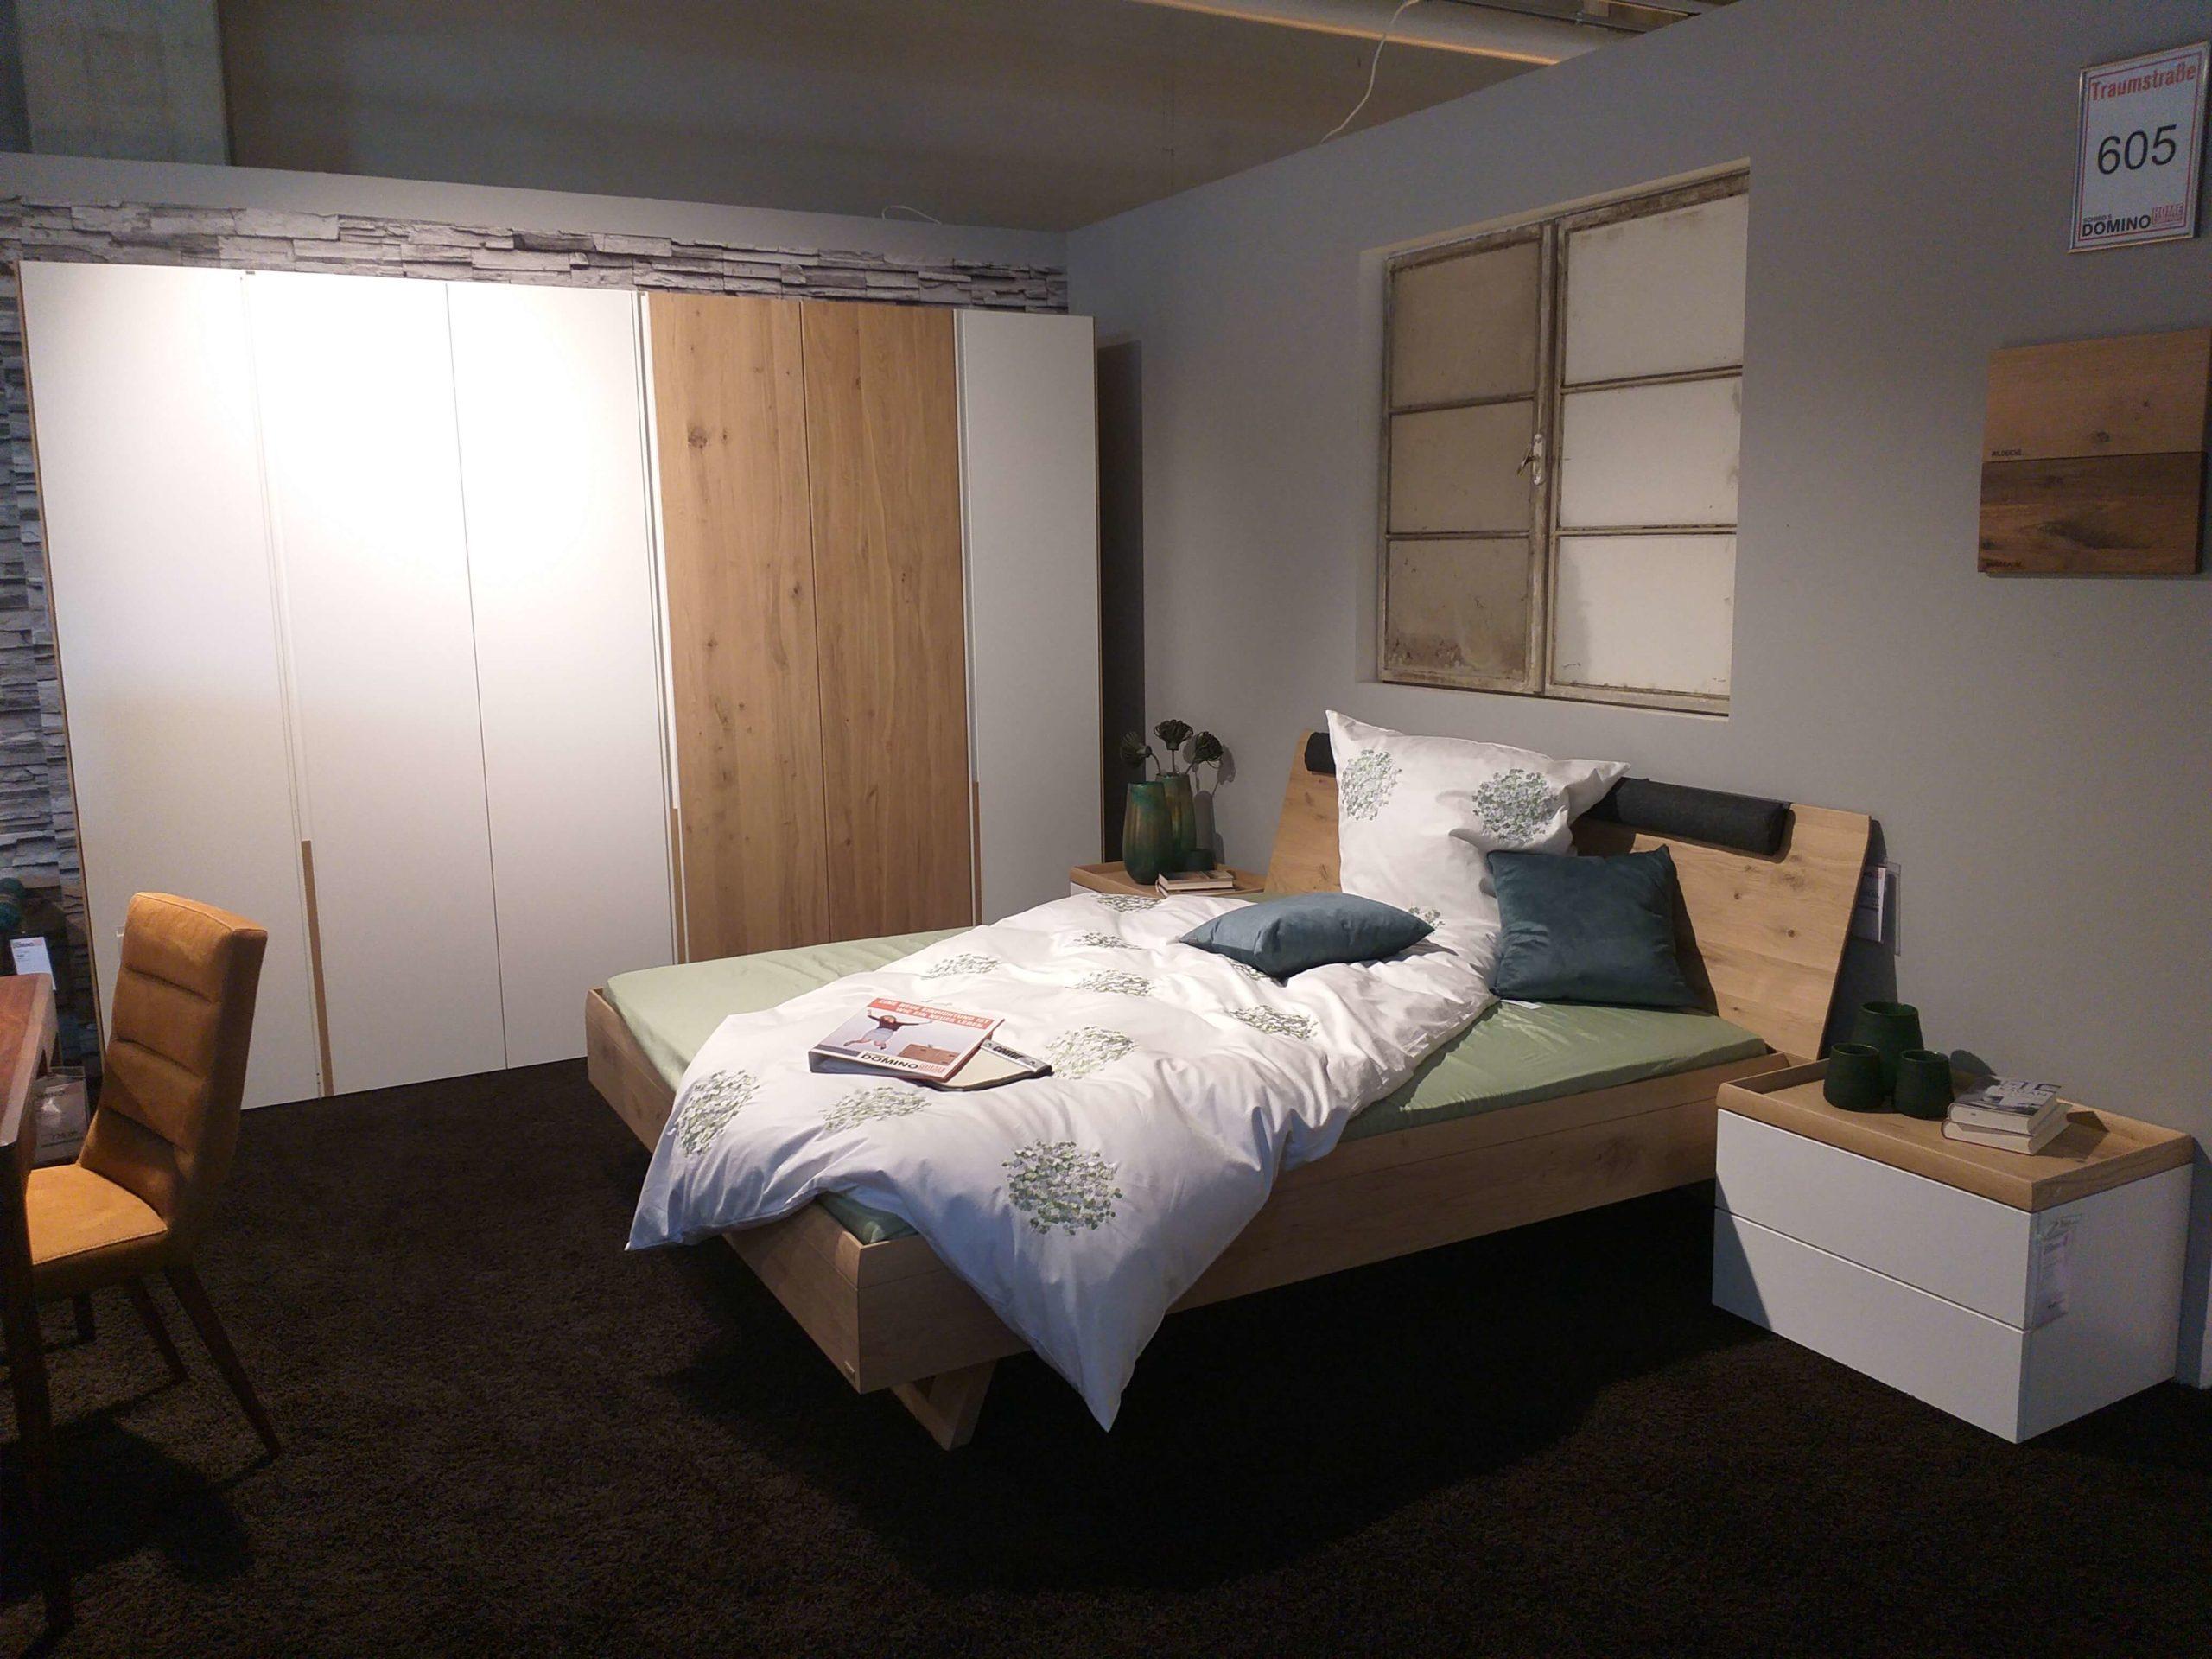 Schlafzimmer Baveno Contur   Home Company Möbel